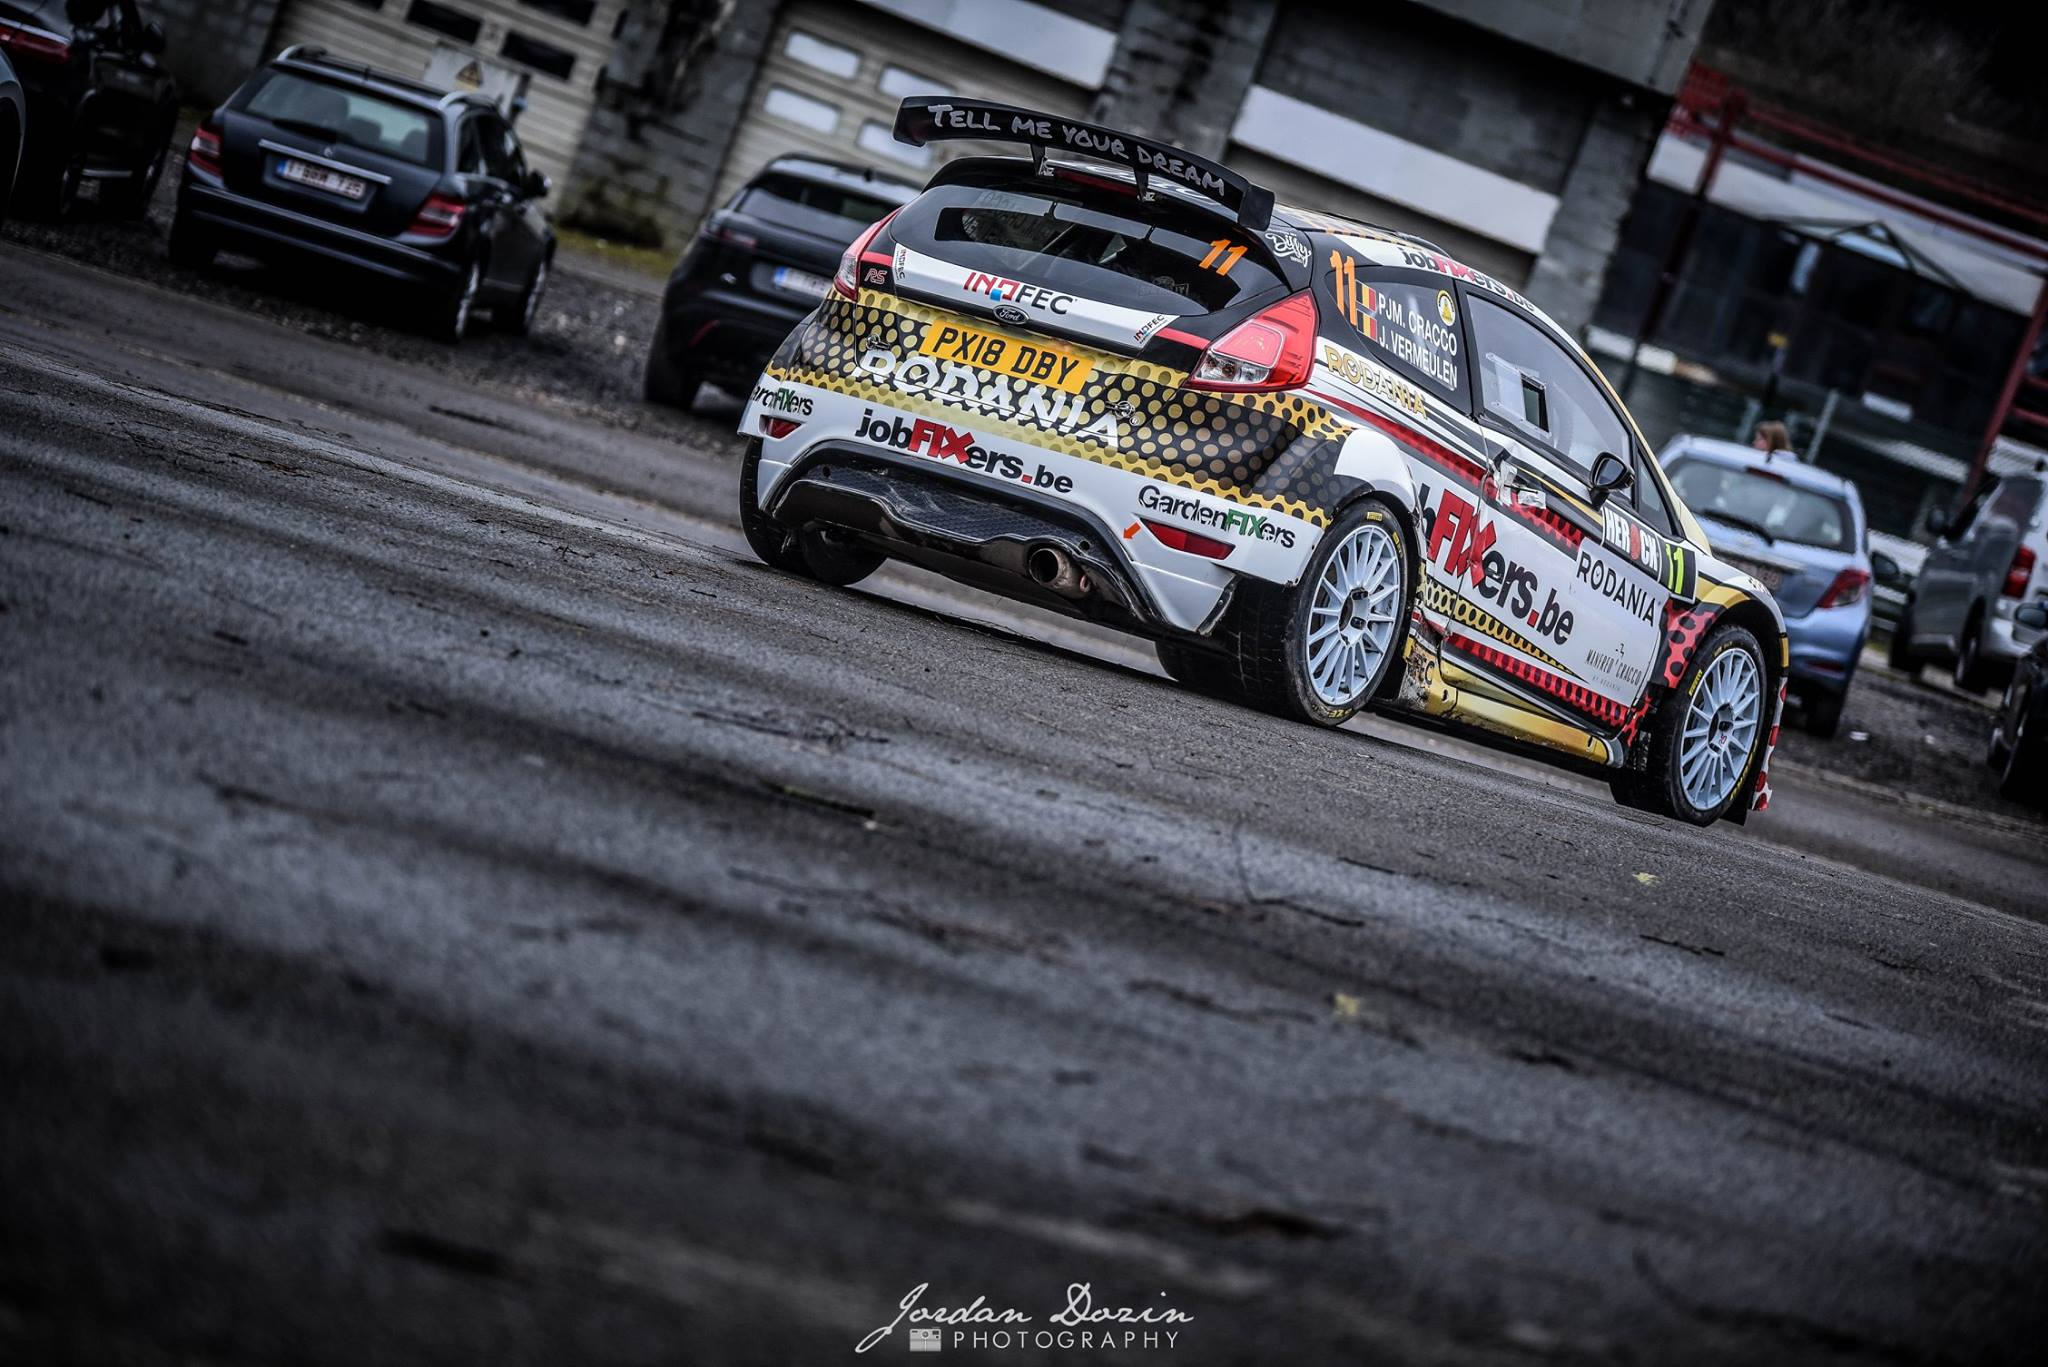 Boxoen pilotera une Ford Fiesta R5 dès le TAC Rally